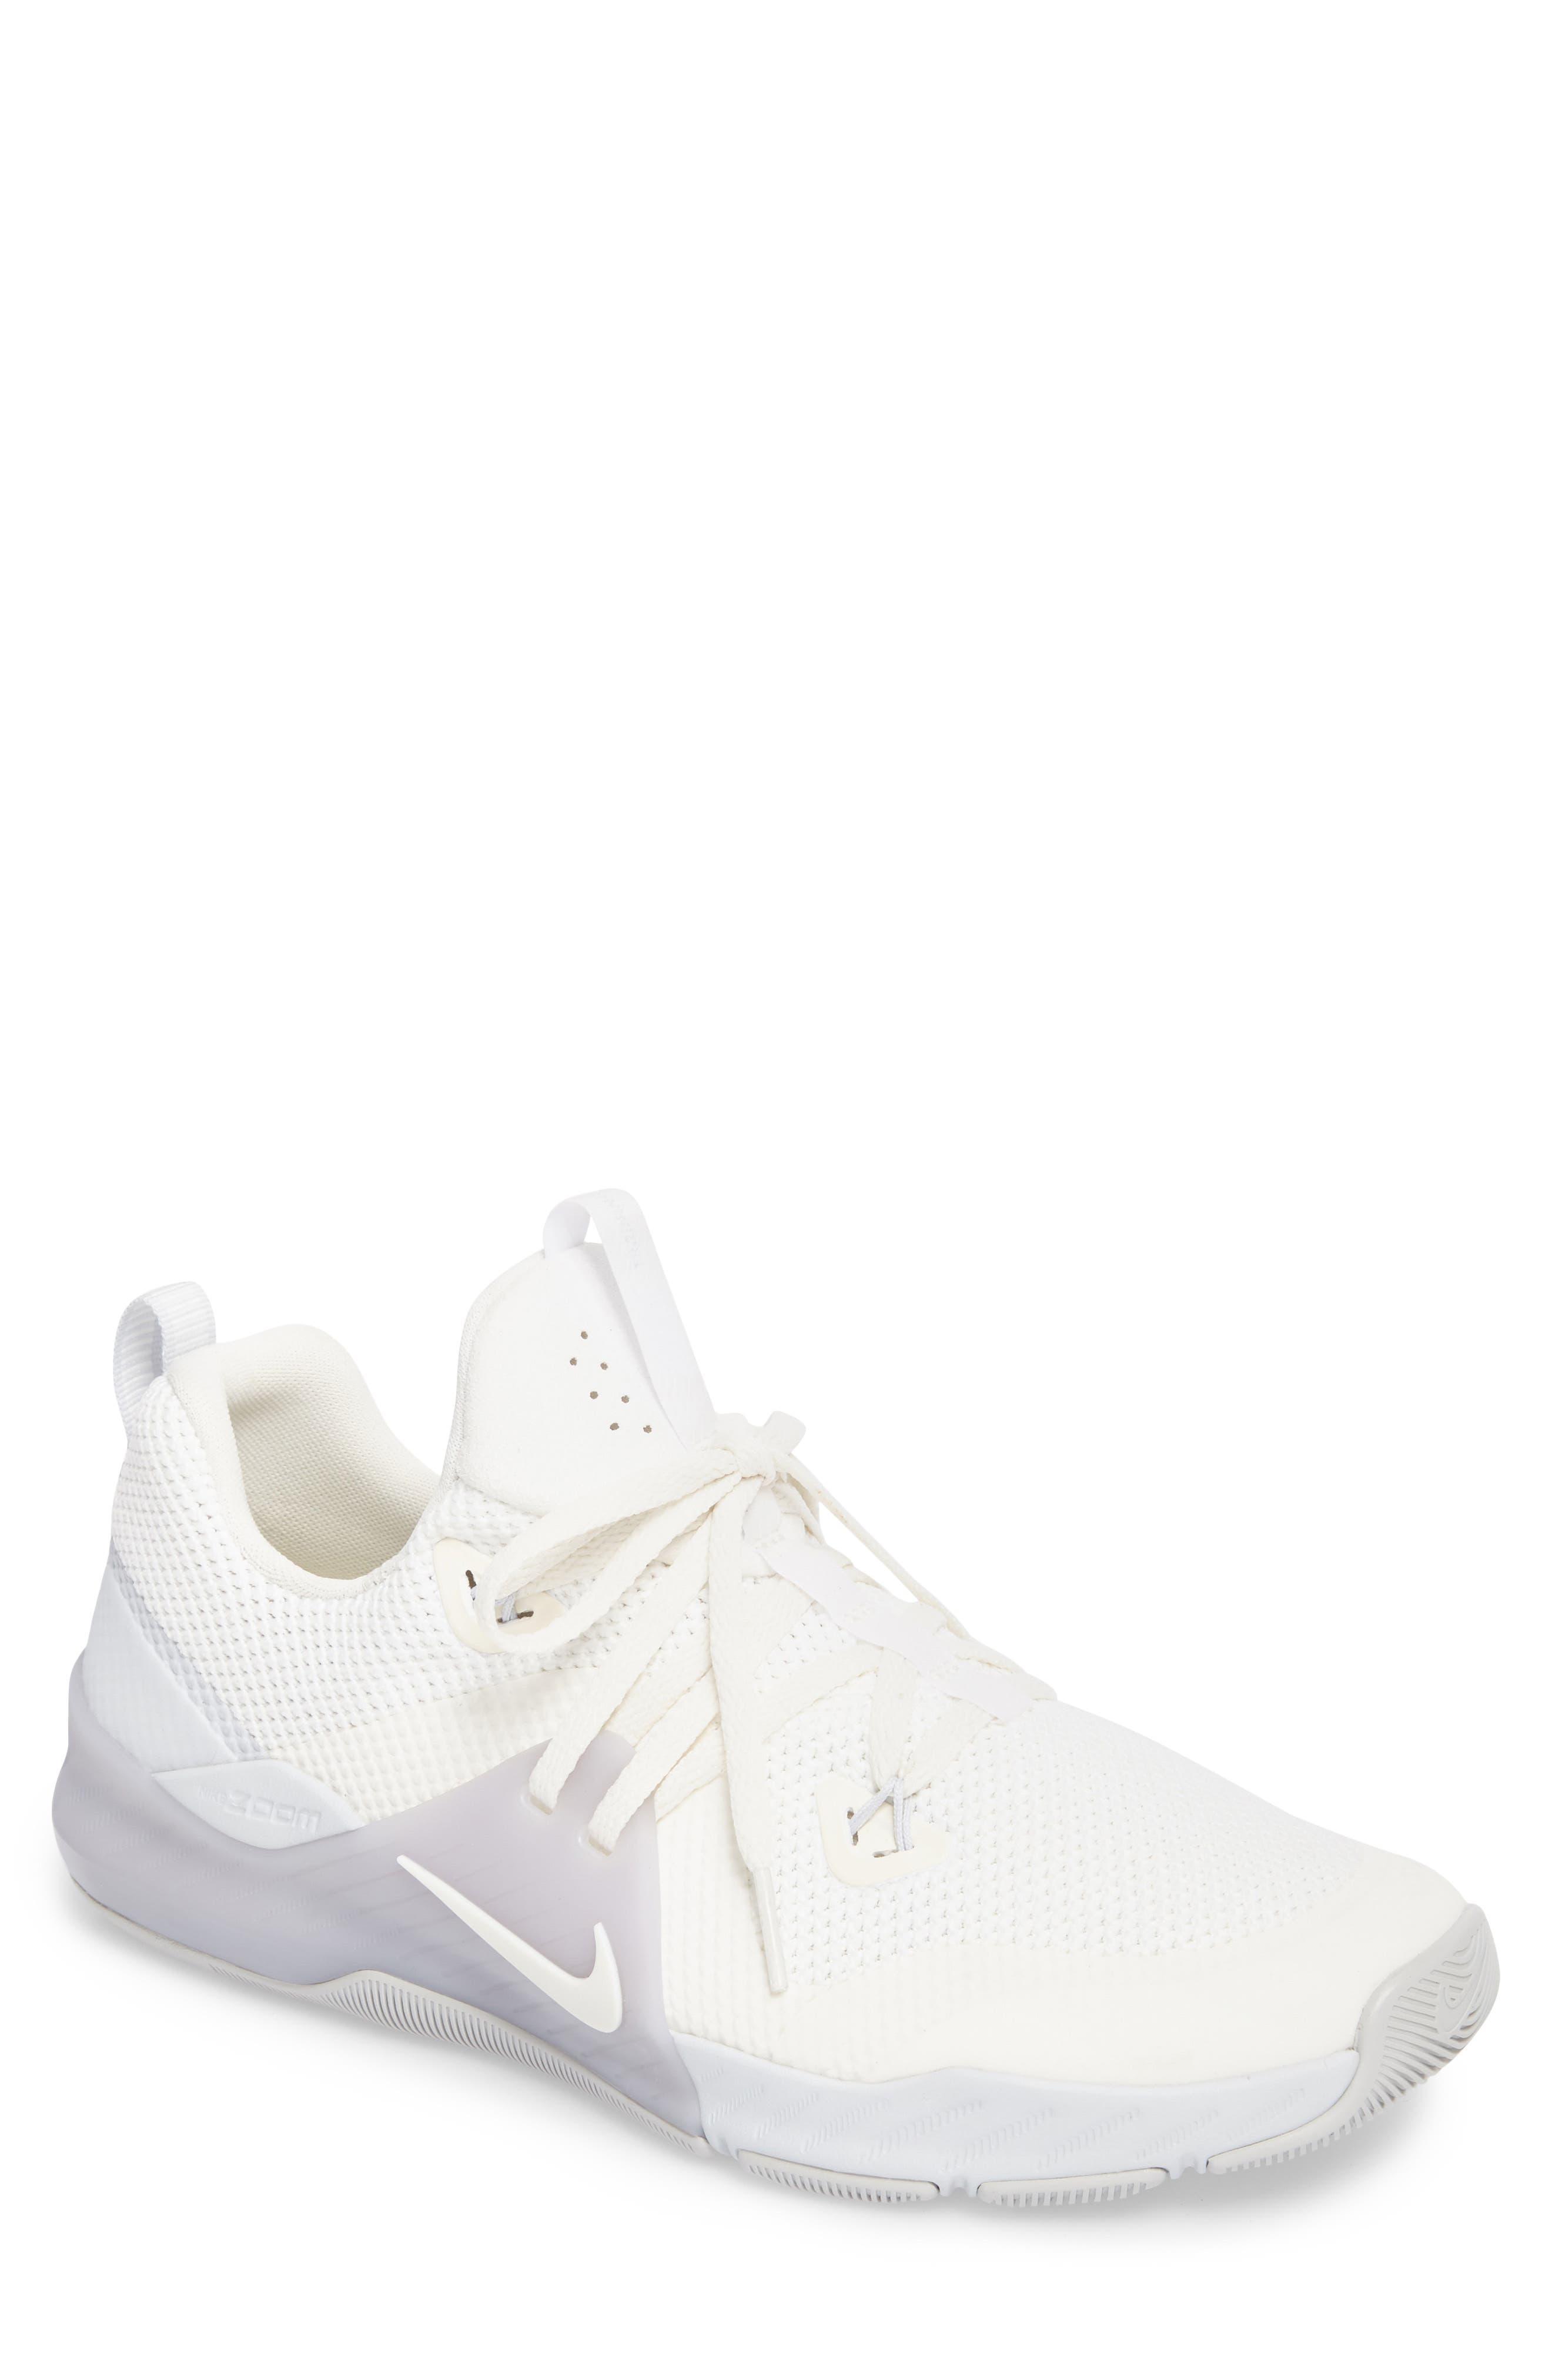 Alternate Image 1 Selected - Nike Zoom Train Command Running Shoe (Men)